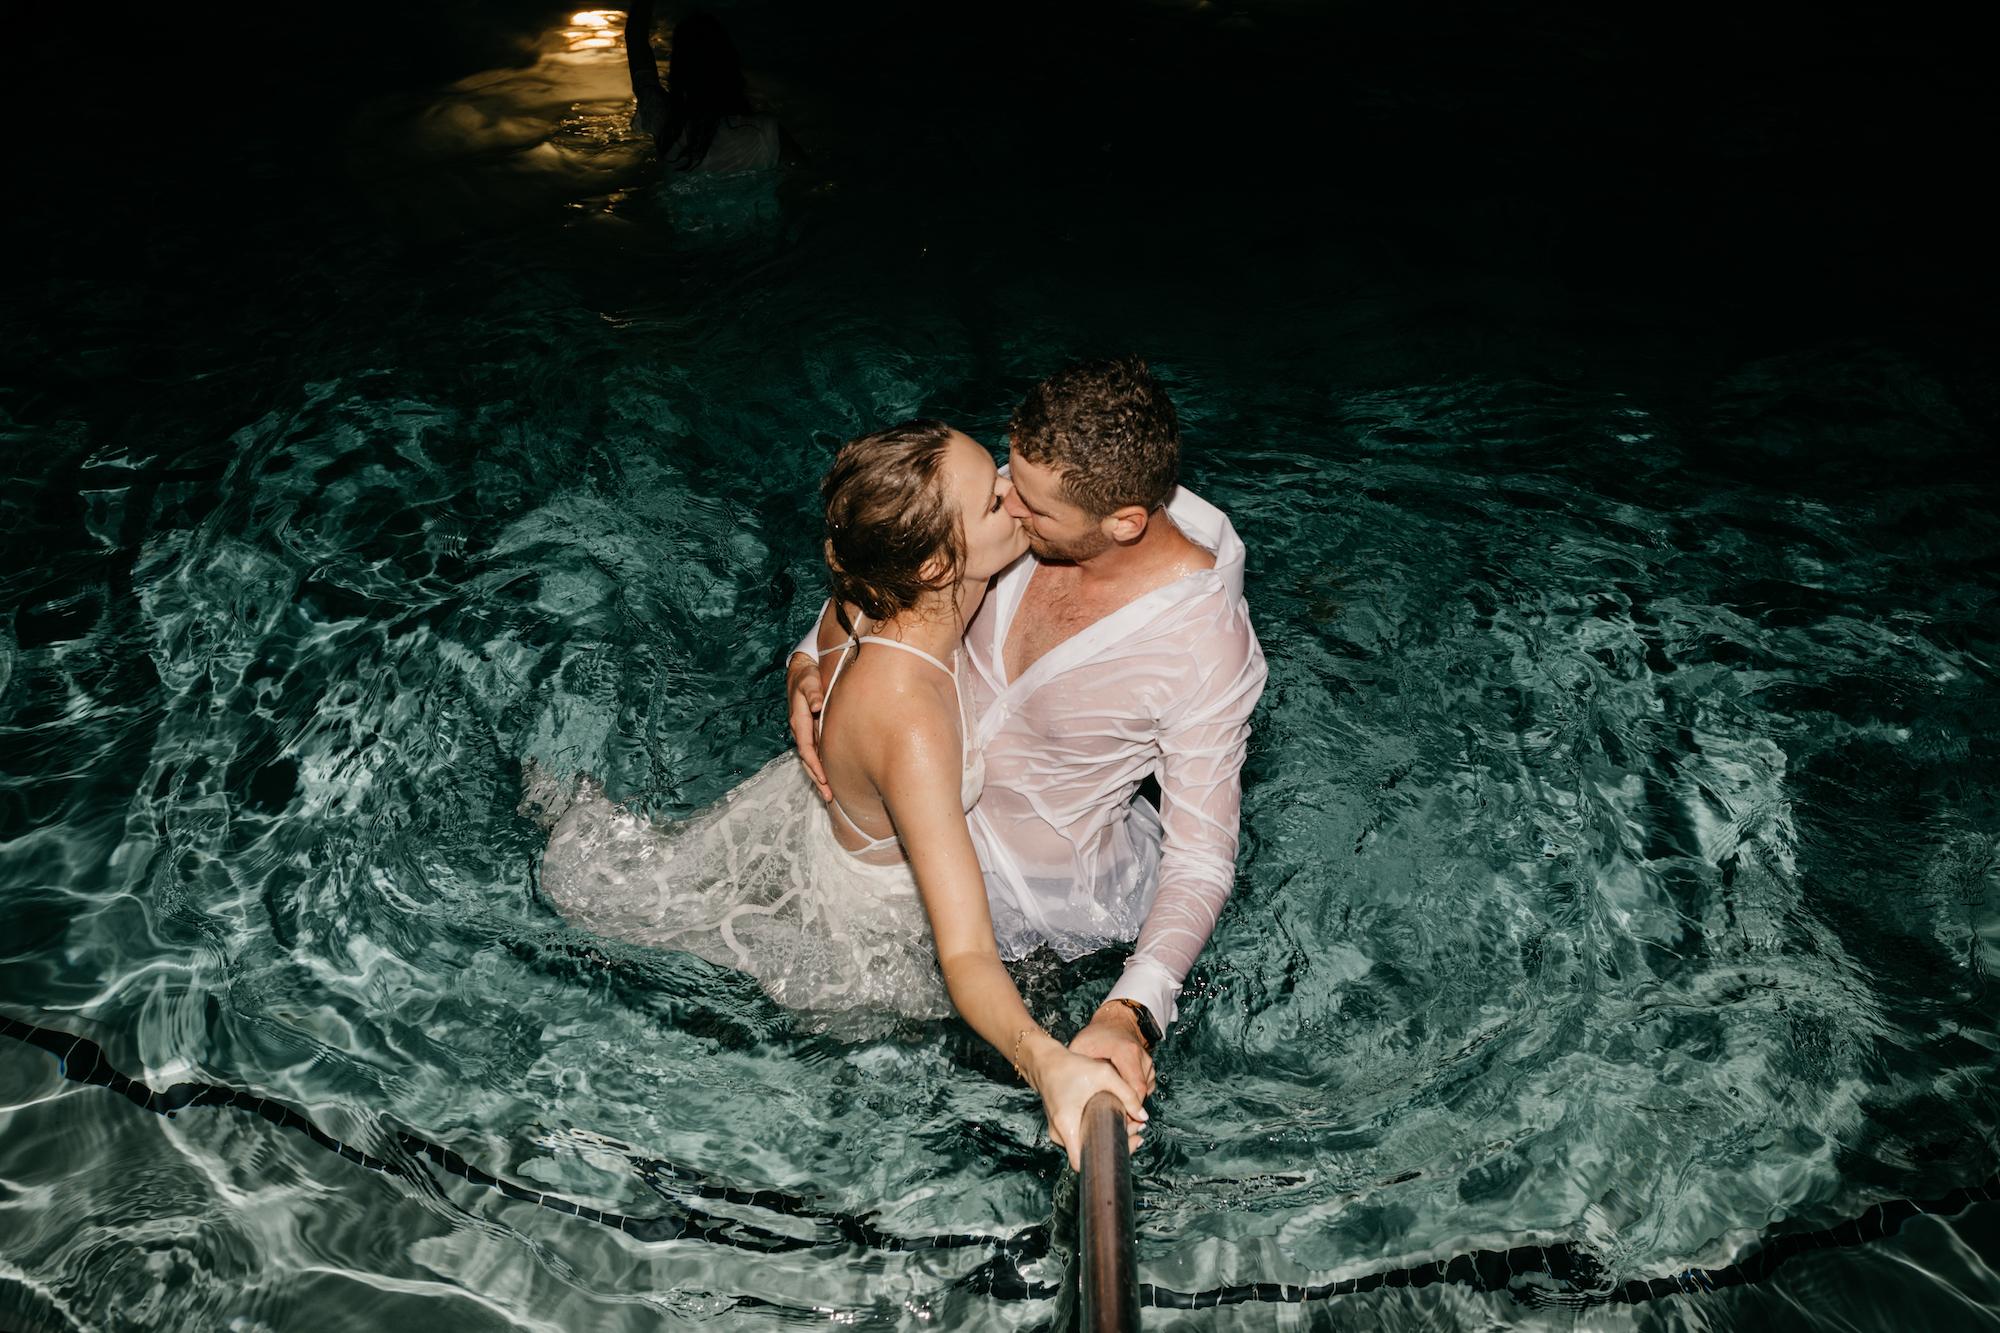 ace-hotel-palm-springs-wedding-photographer932.jpg